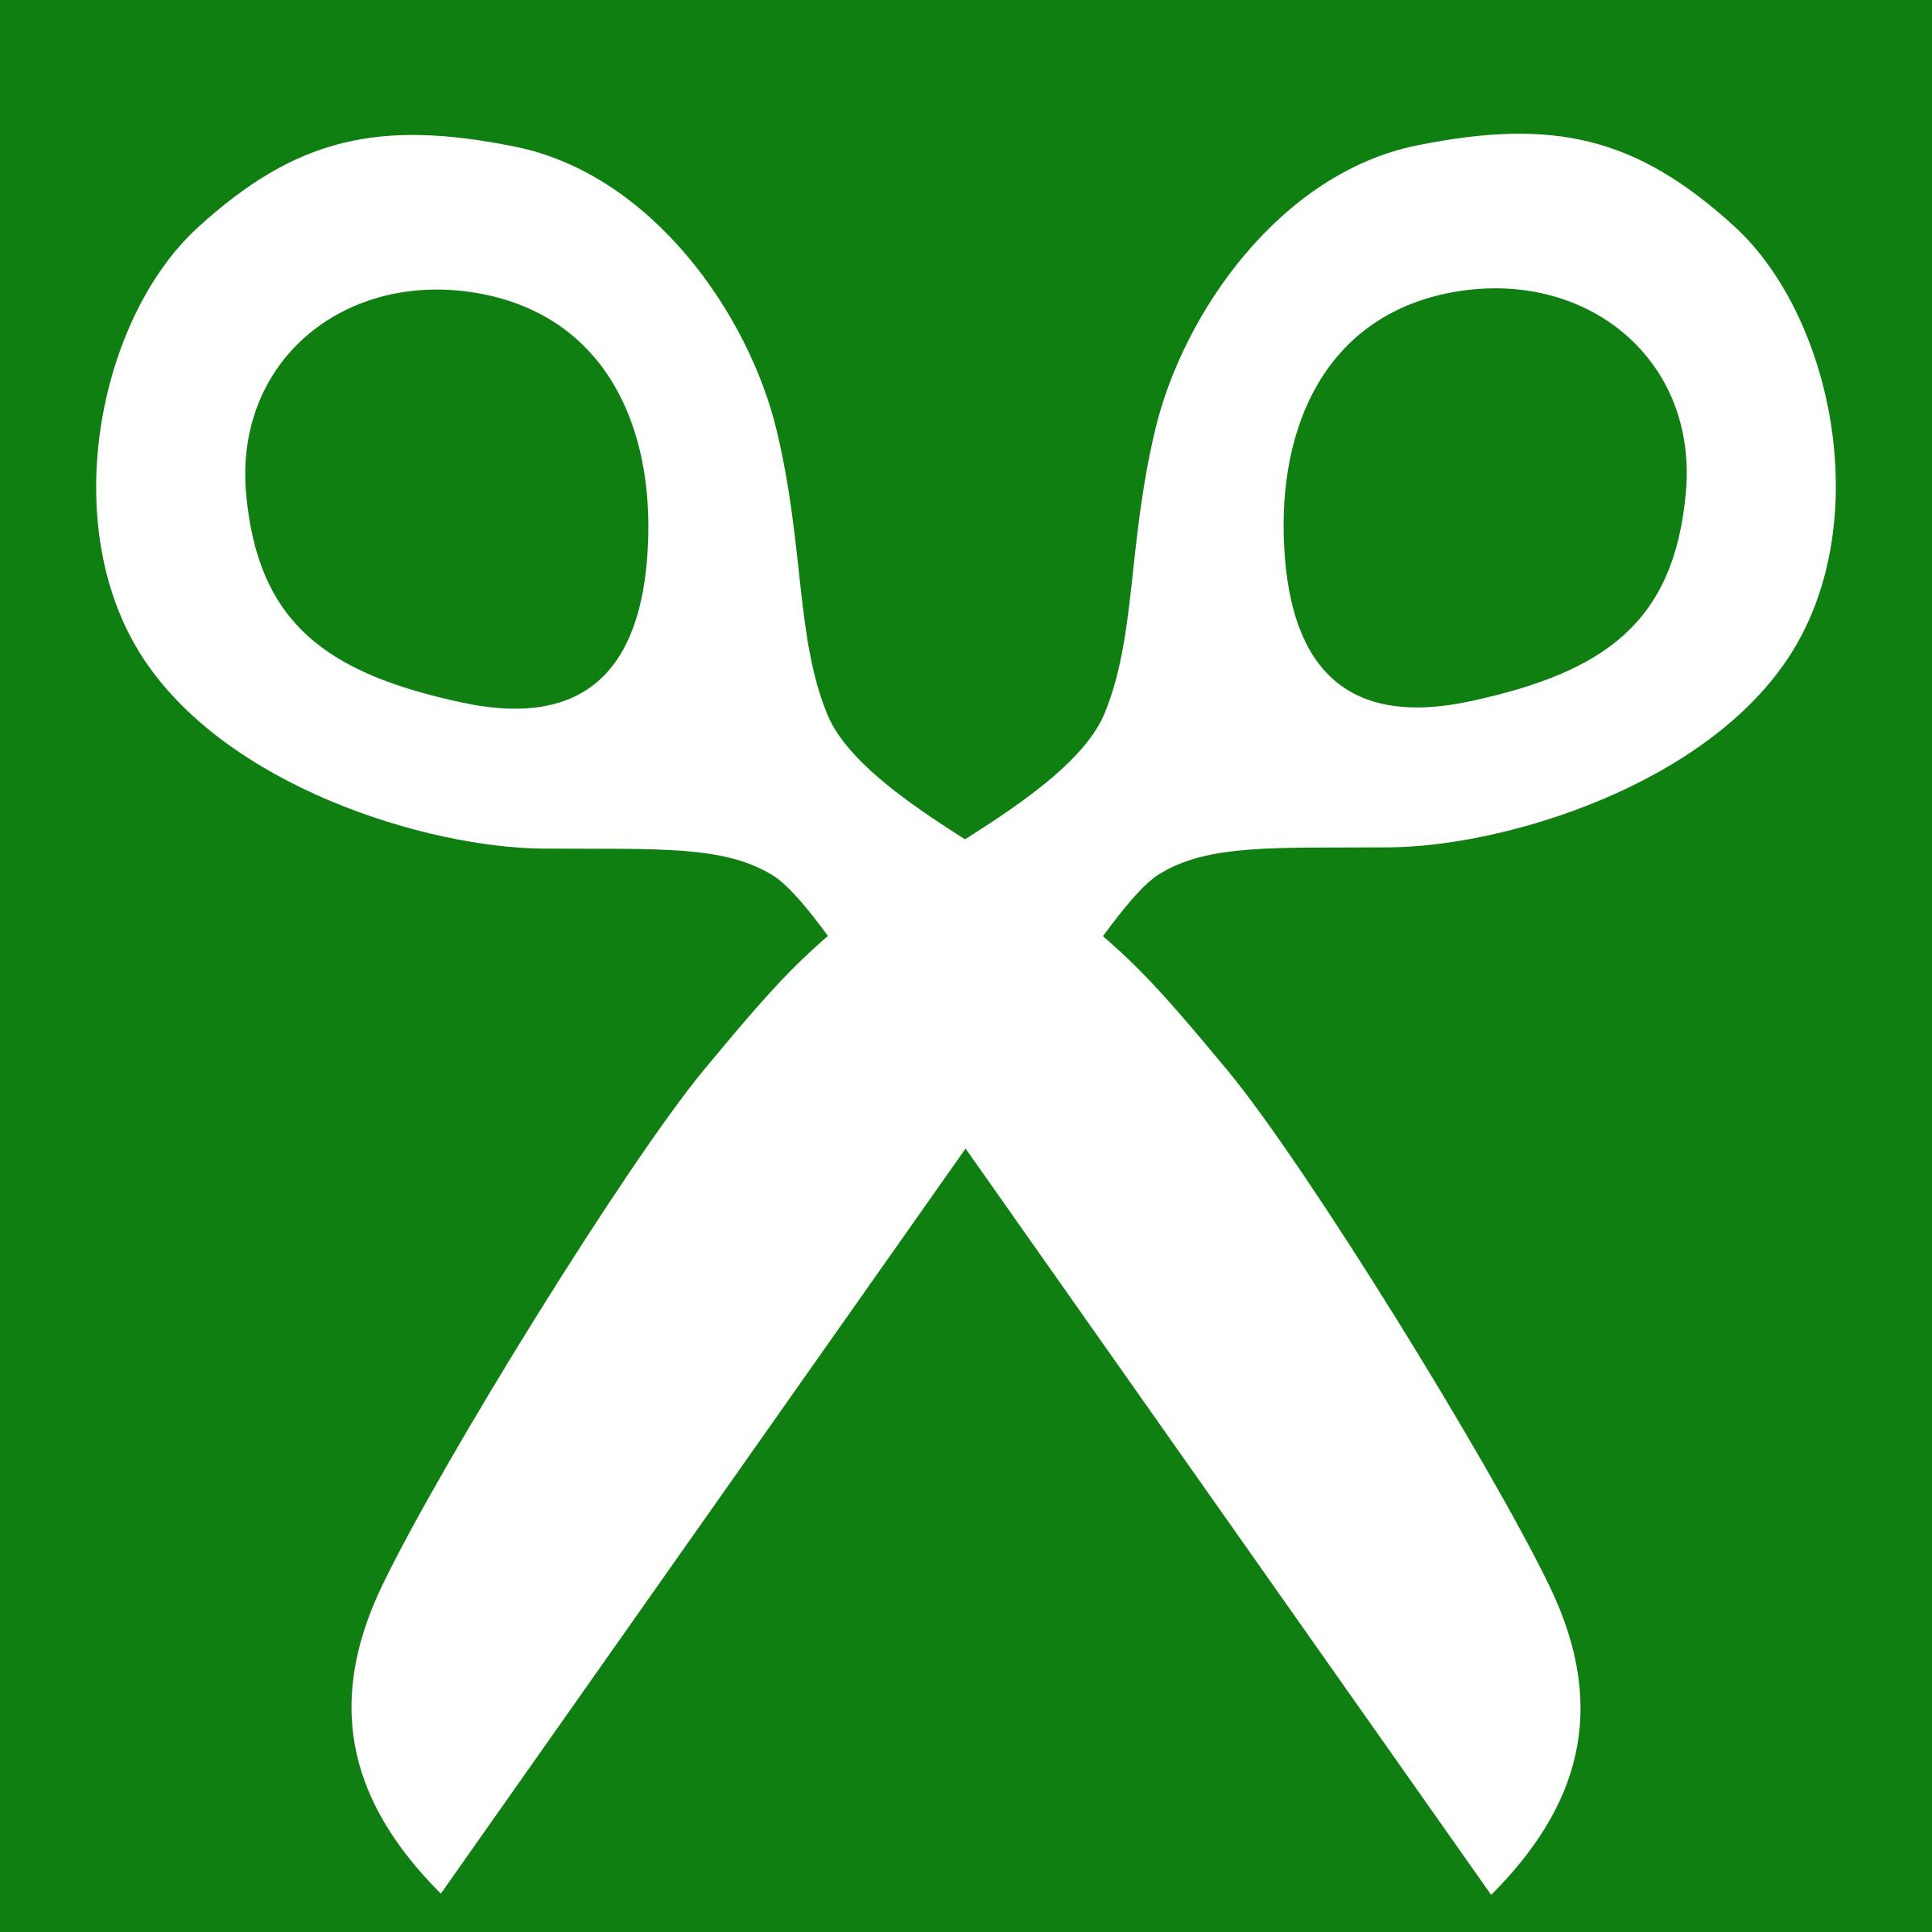 Clipart Cross Xxviii